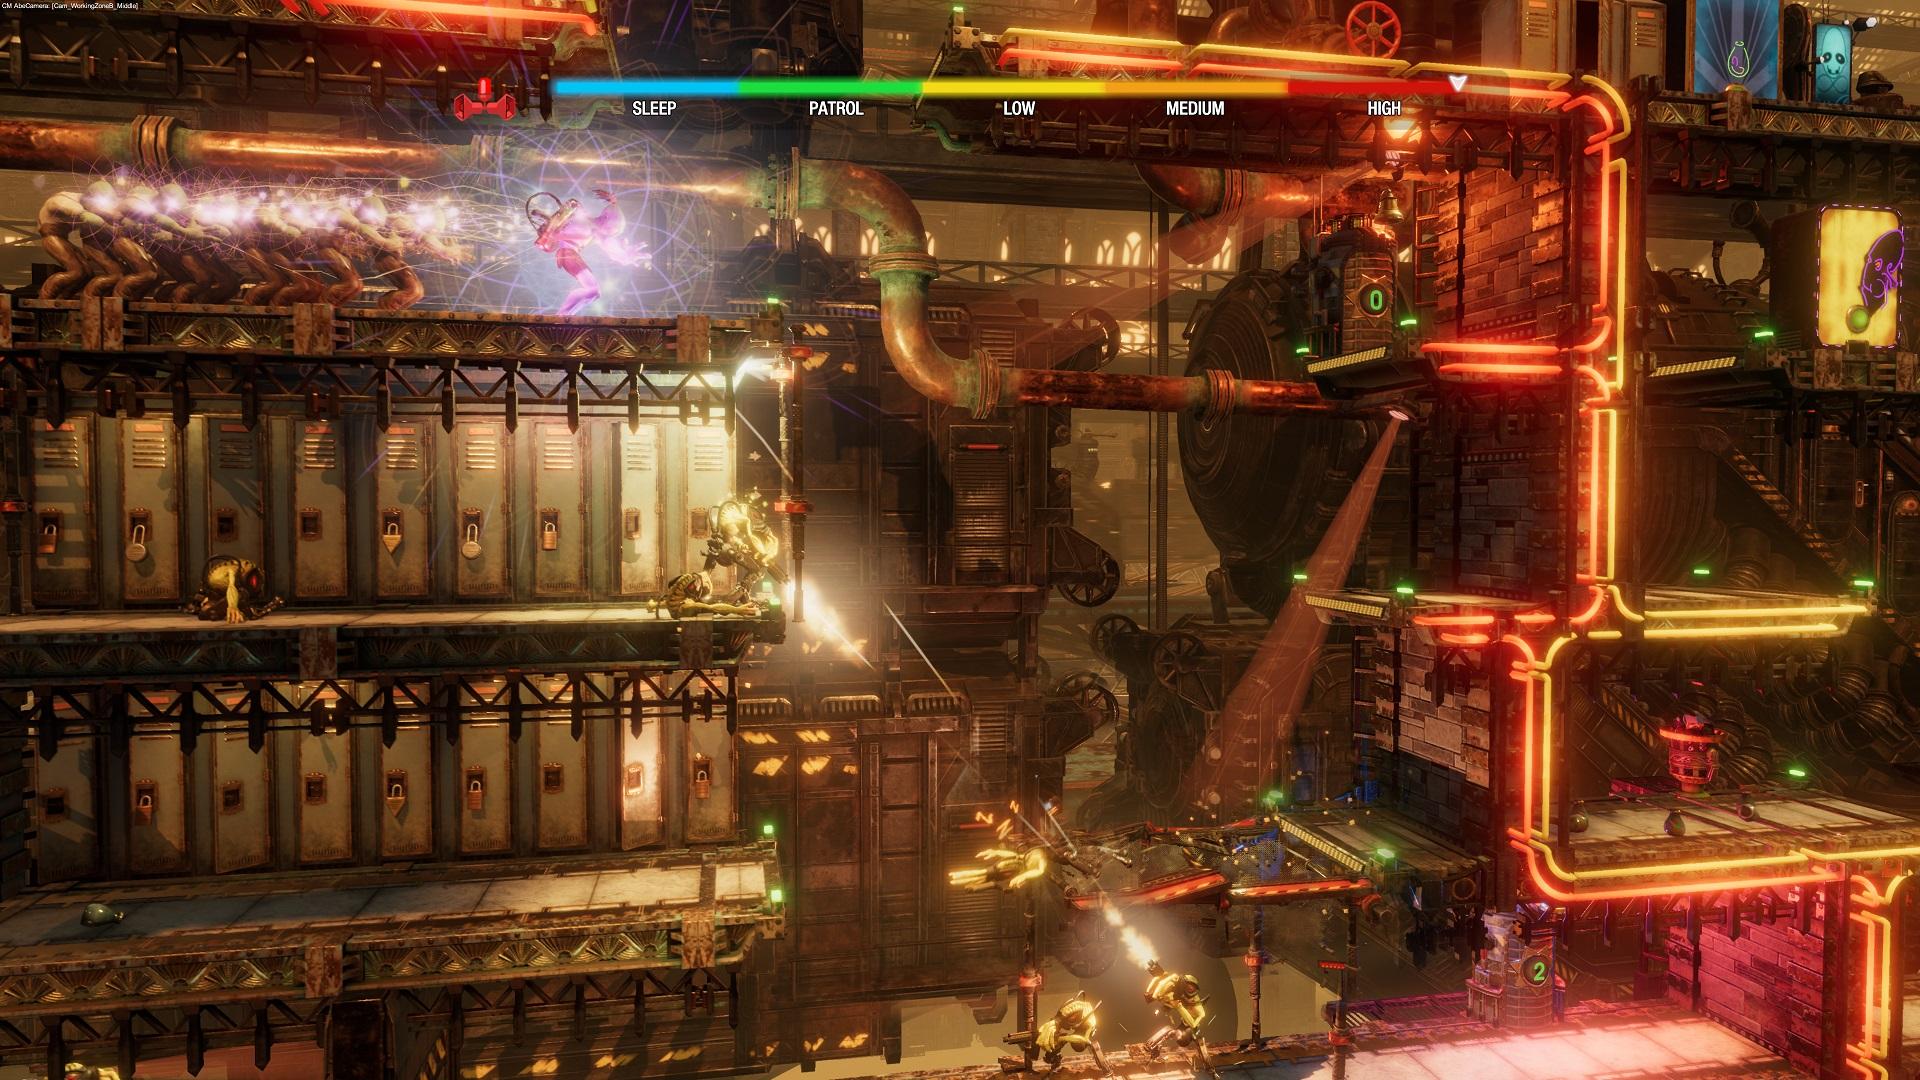 Oddworld: Soulstorm Hands-On Preview - E3 2019's Biggest